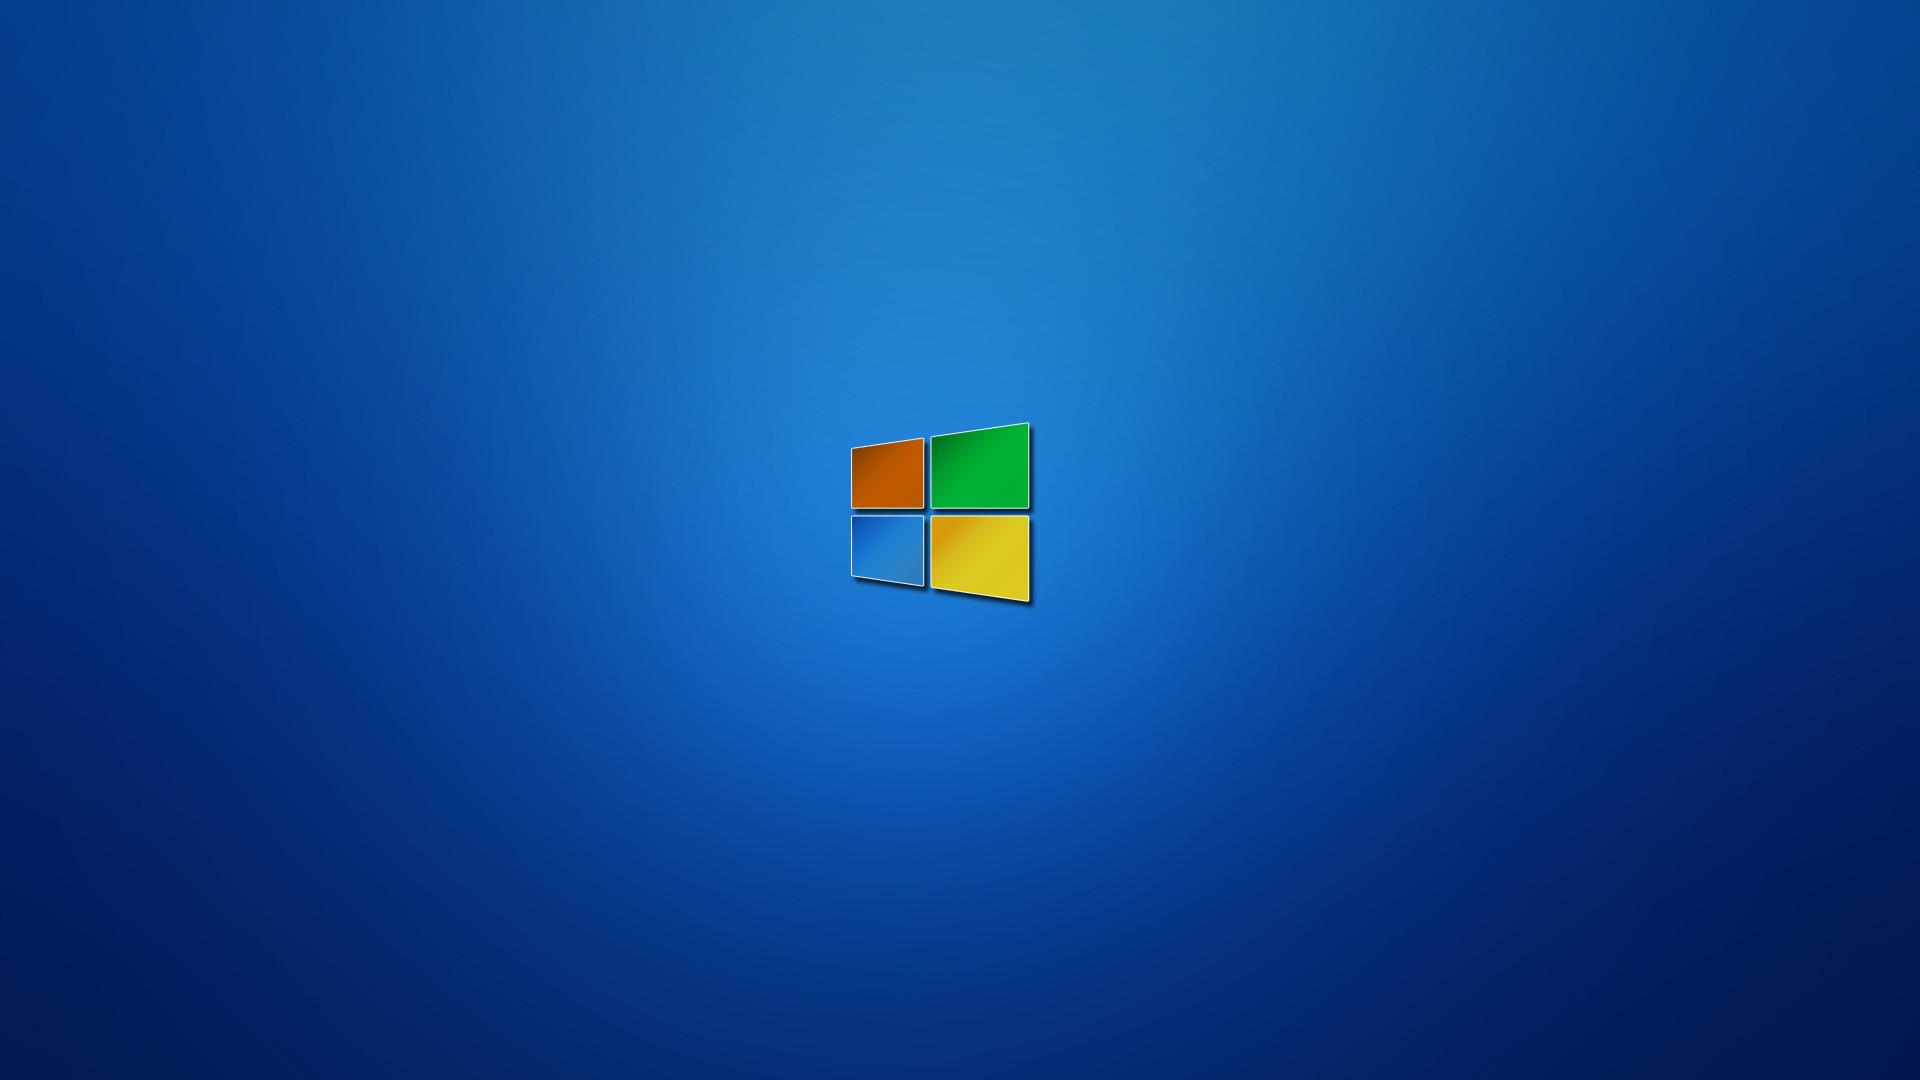 Wallpaper Windows 8 бесплатно